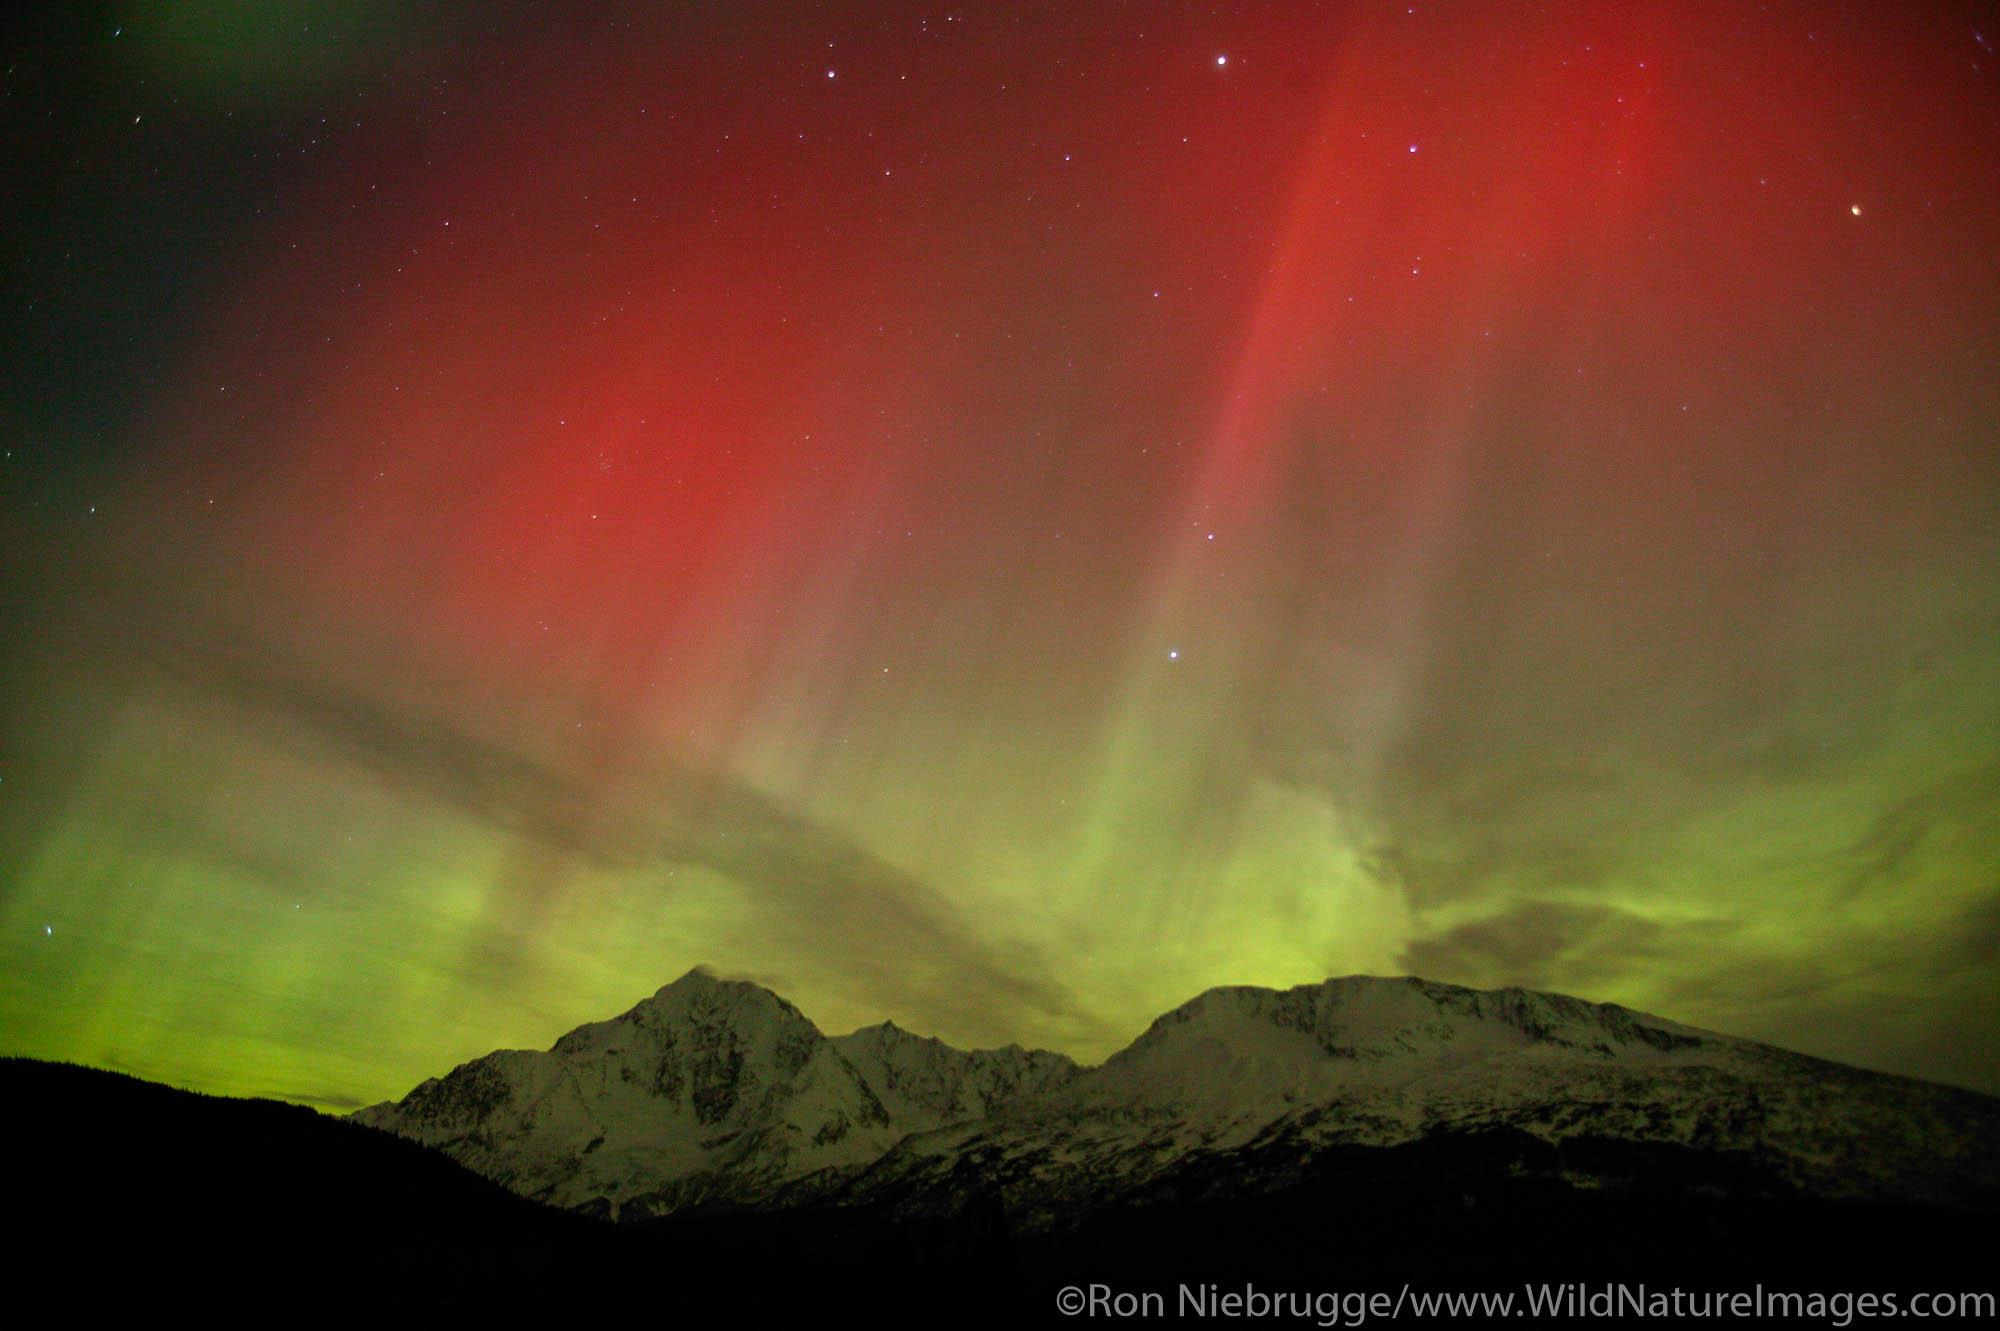 Colorful Northern Lights (Aurora Borealis), Chugach National Forest, on the Kenai Peninsula near Seward, Alaska.